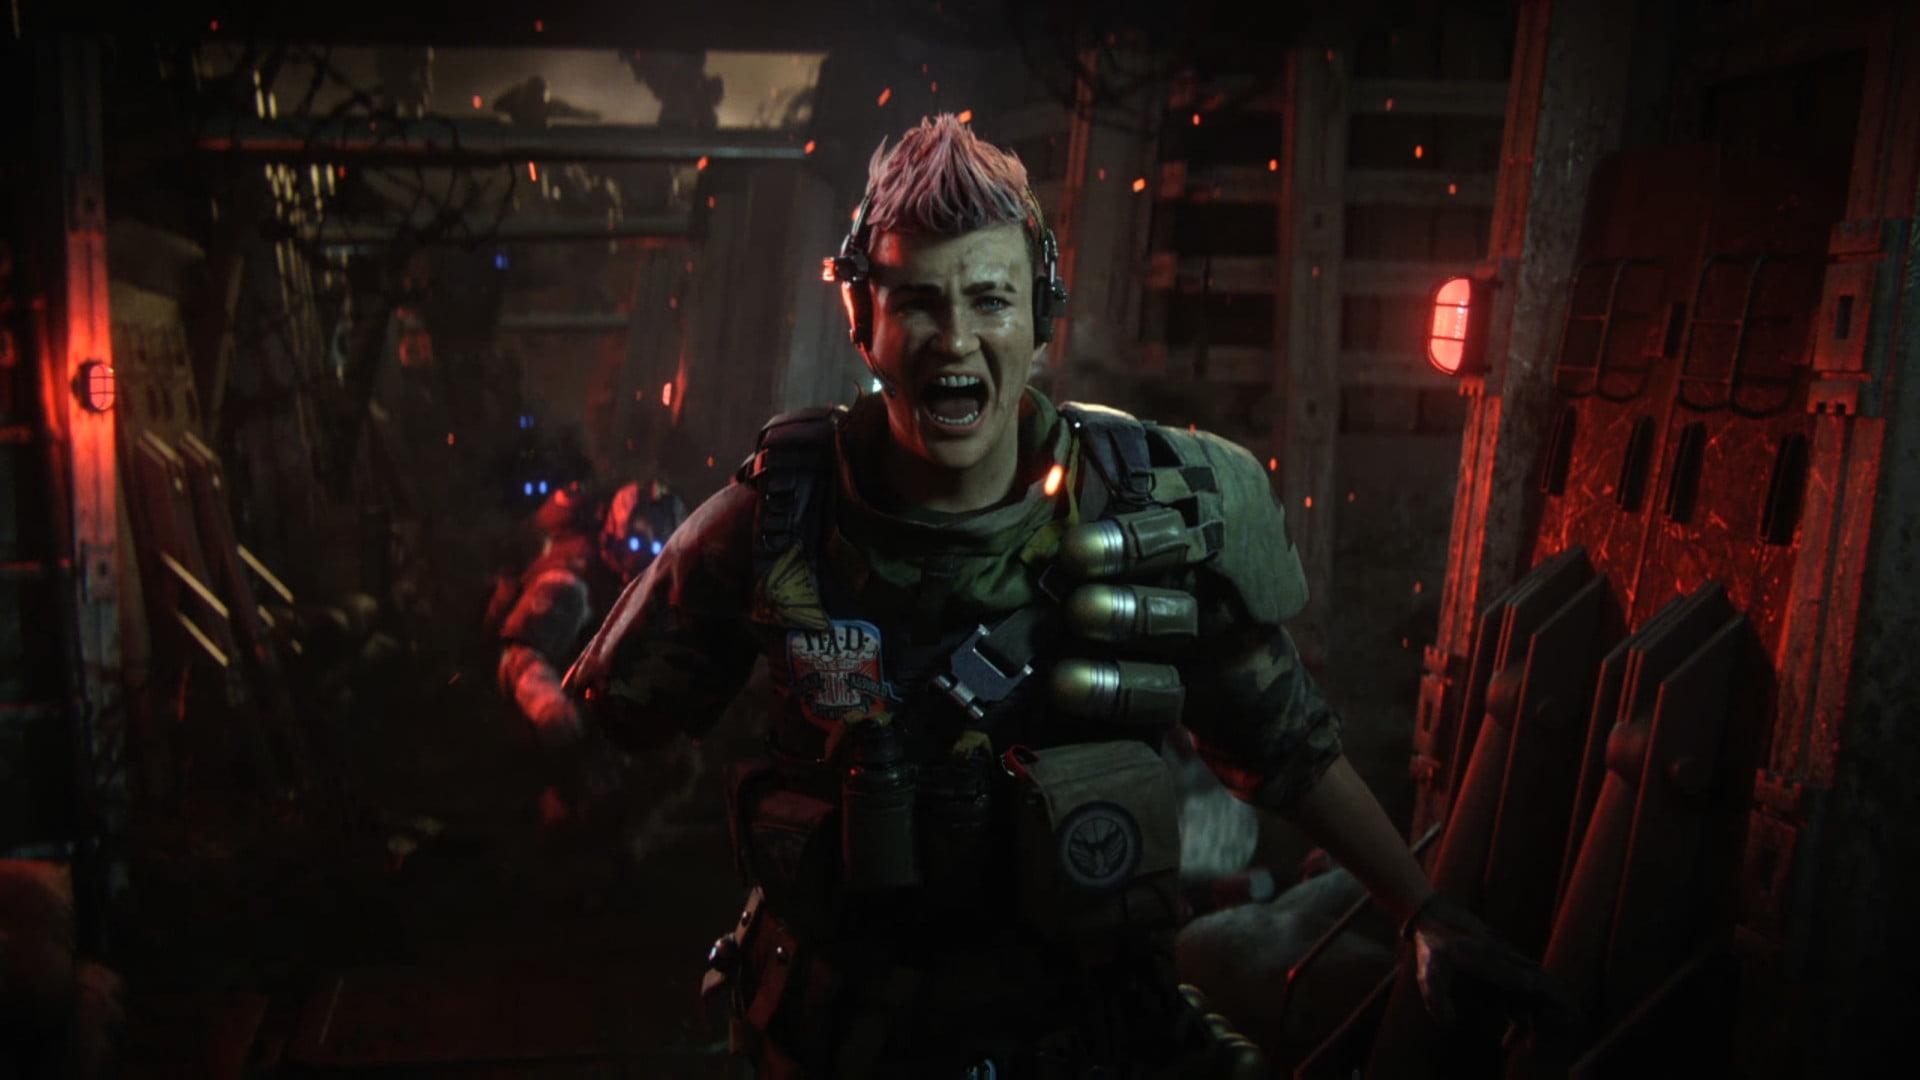 Call Of Duty Black Ops 4 Nikolai How To Unlock Nikolai In Blackout